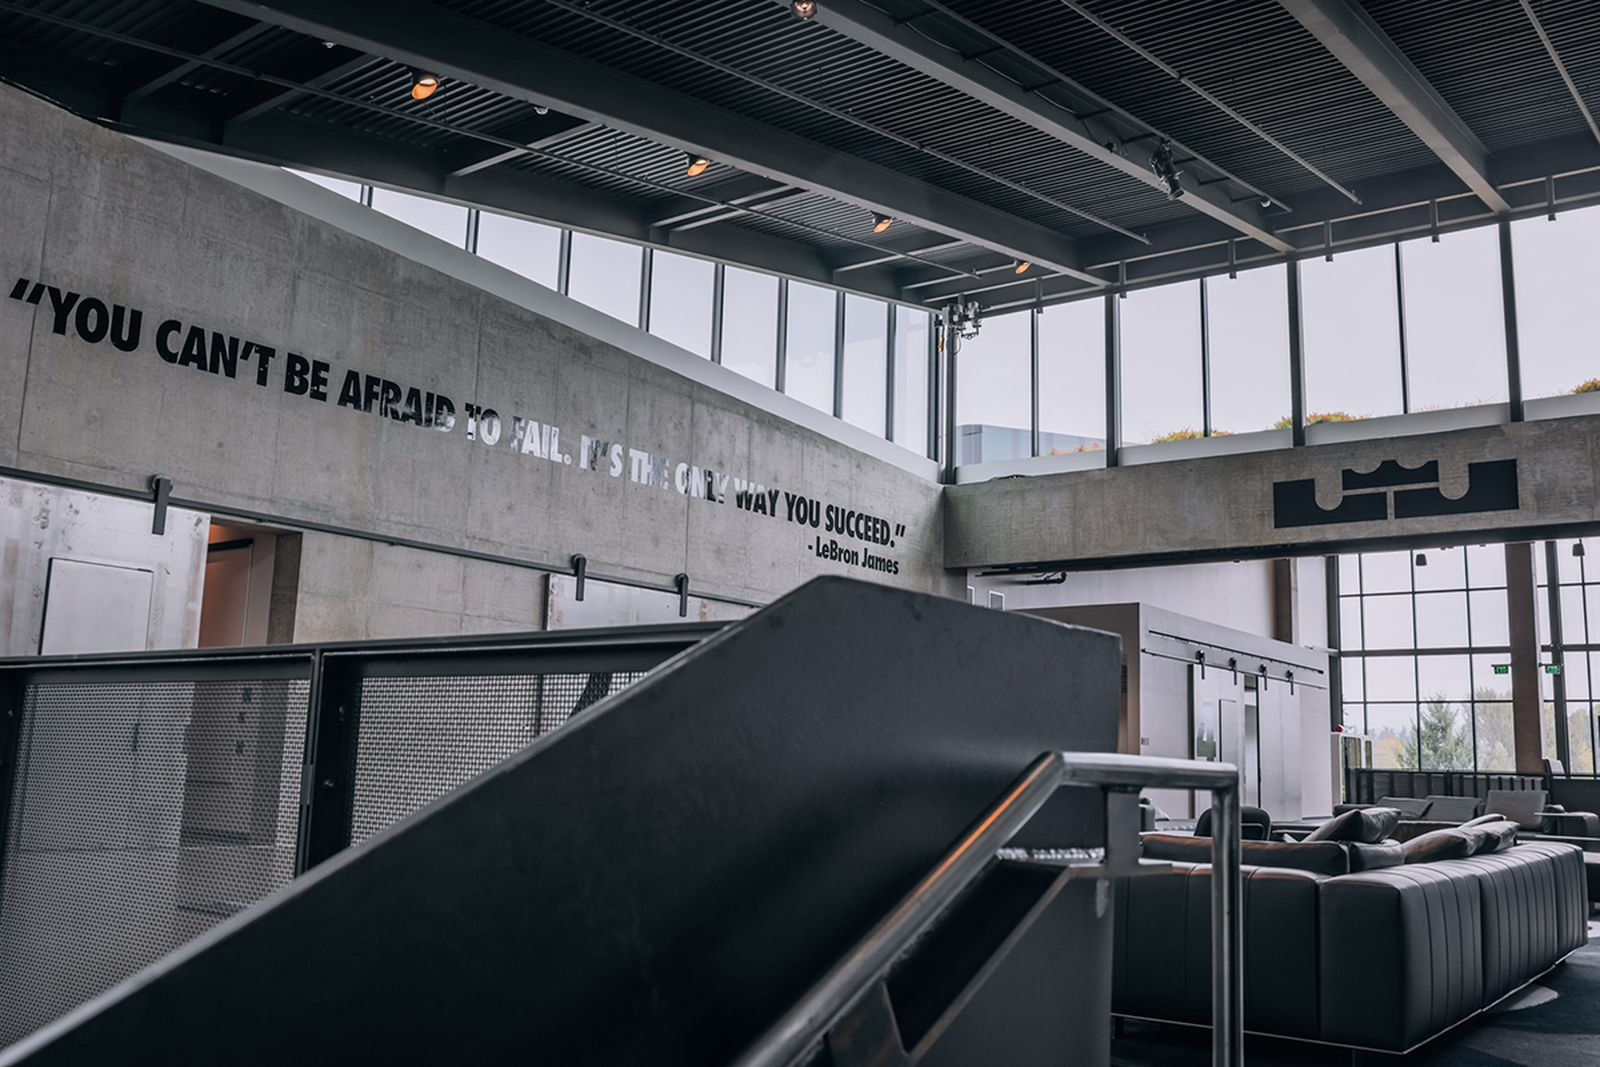 nike-lebron-james-innovation-center- (9)